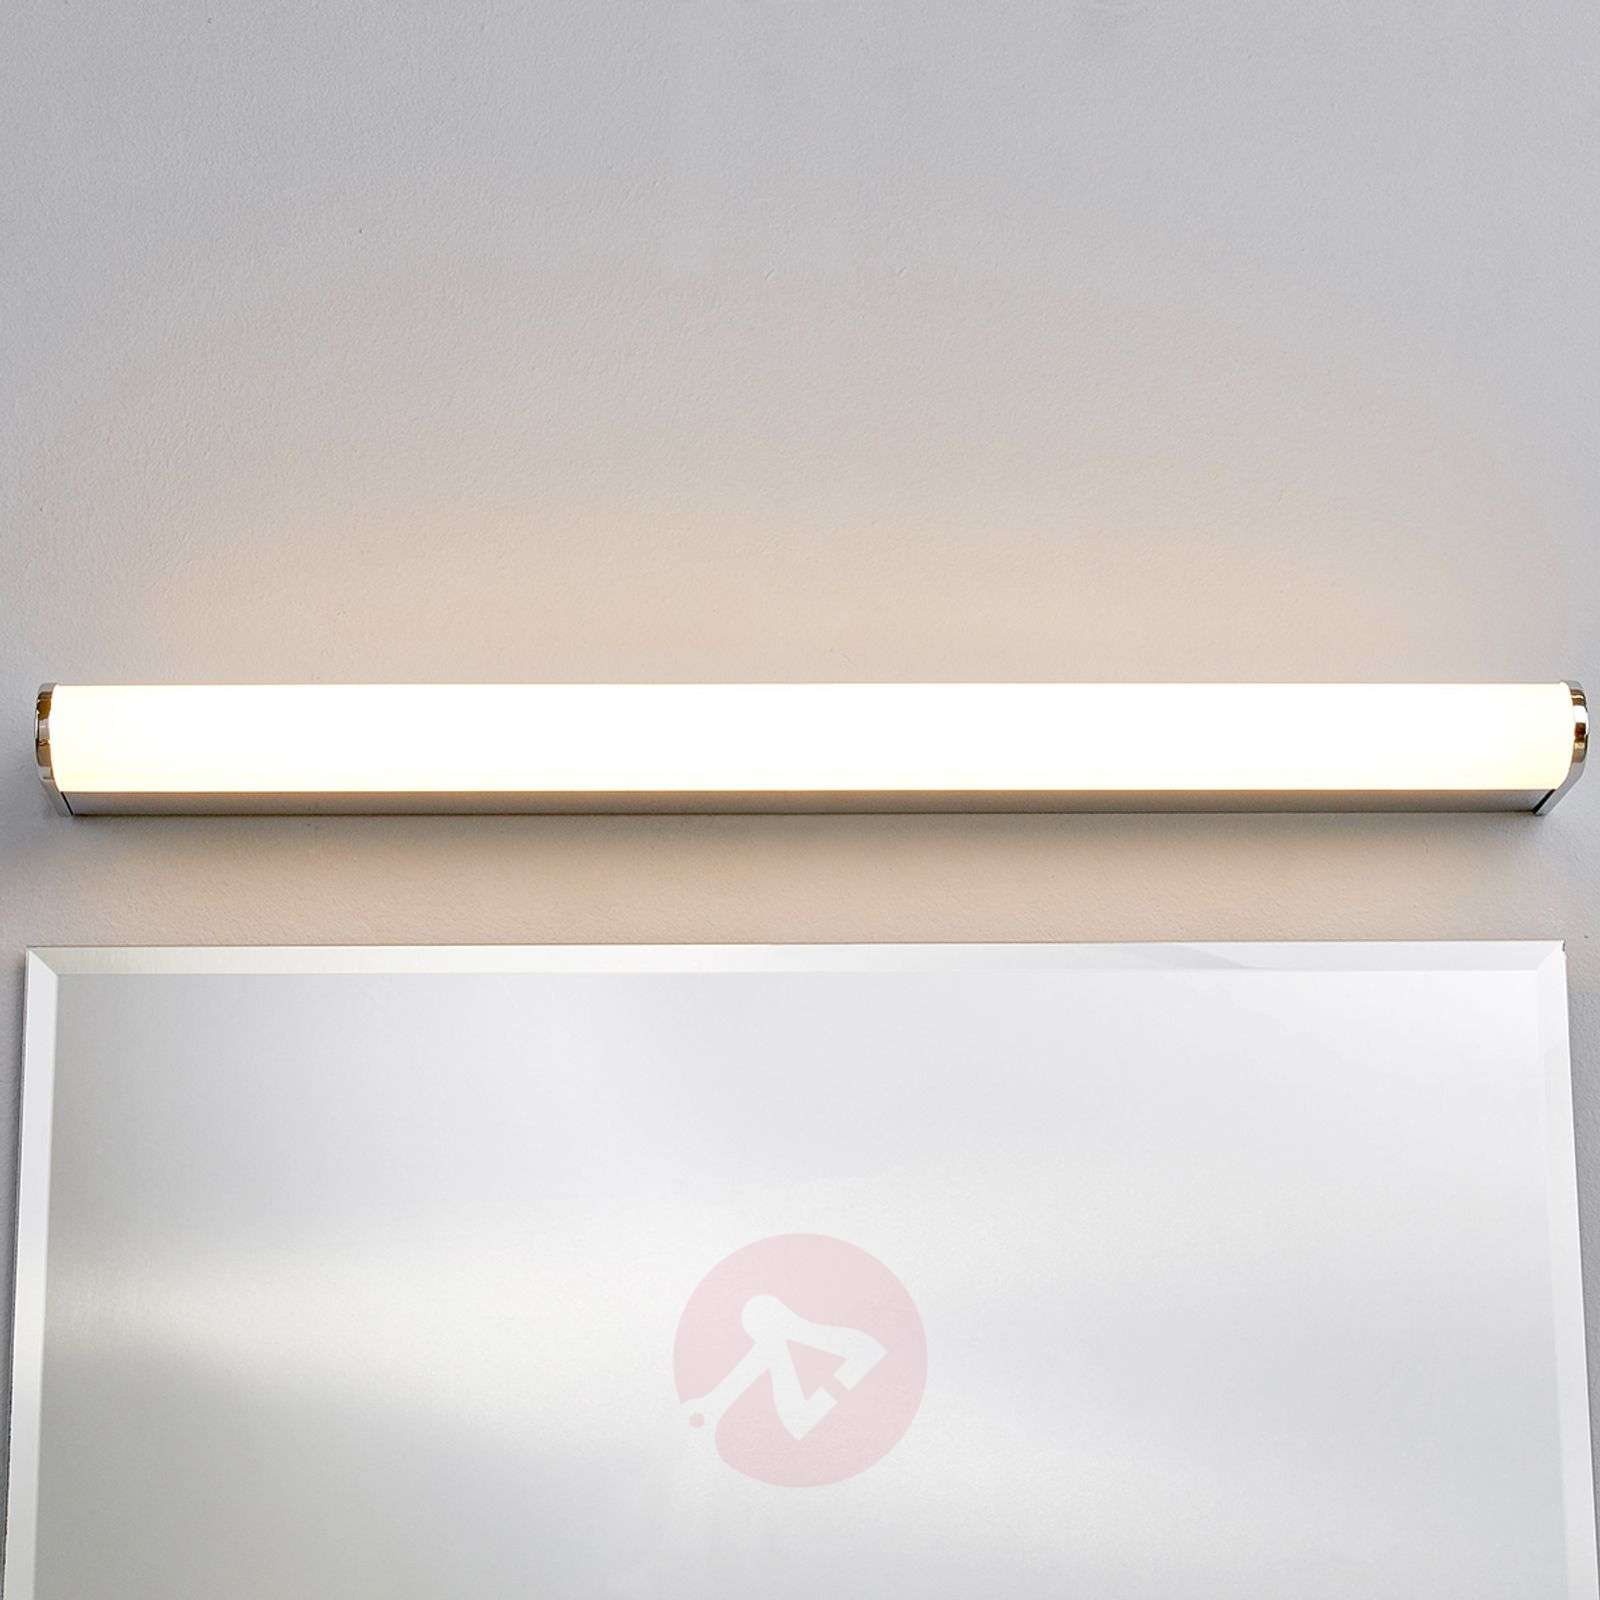 LED-kylpy ja peilivalaisin Philippa-9641012-03